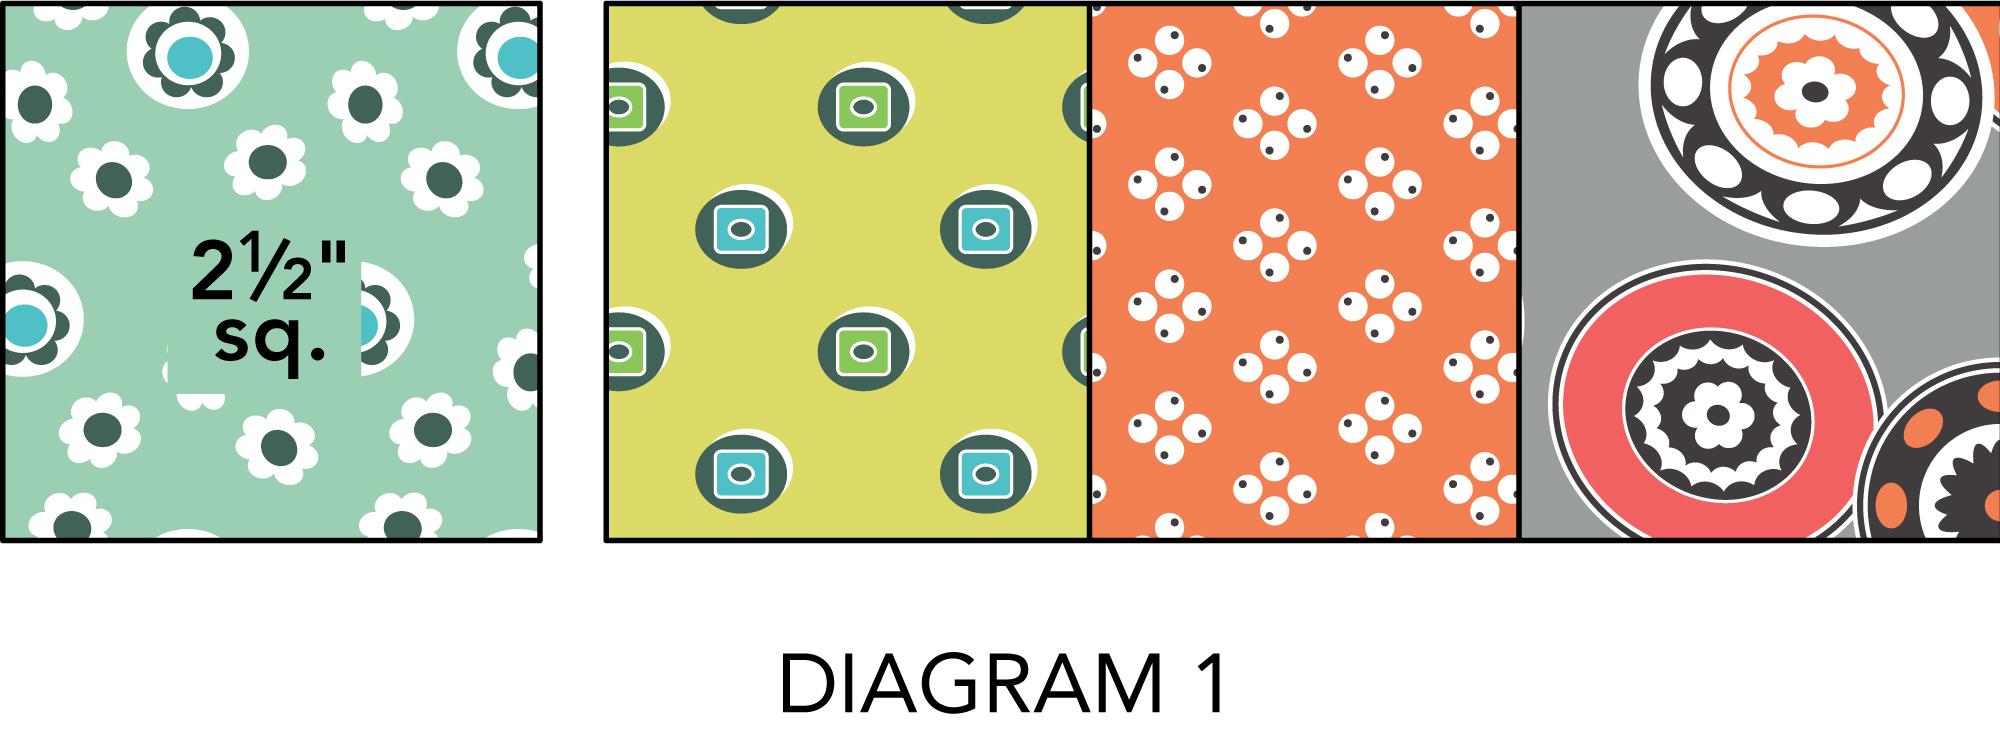 Sew Write pouch diagram 1